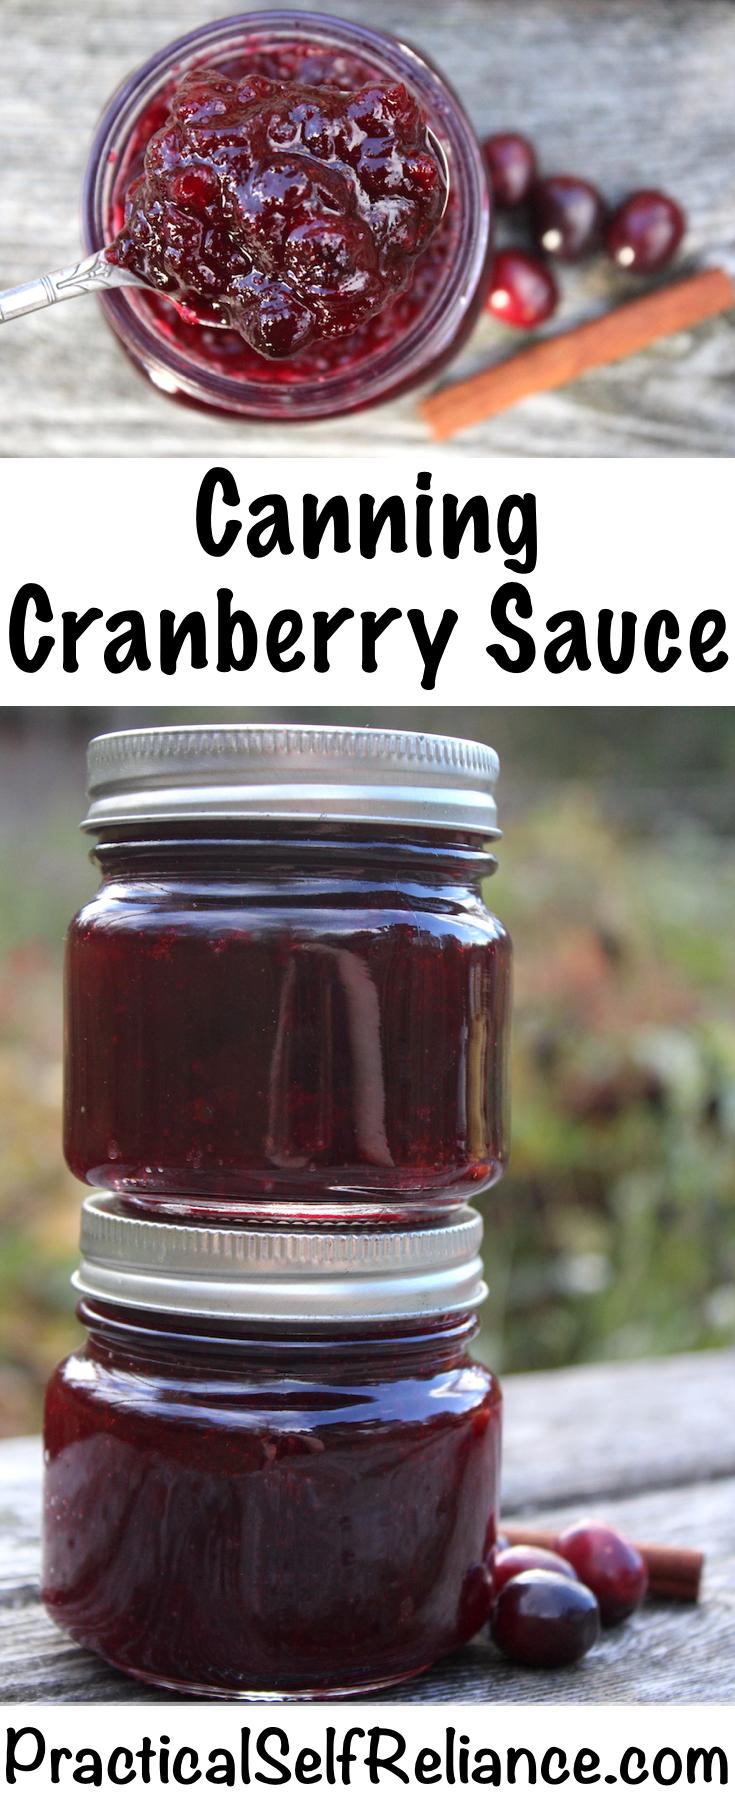 Canning Cranberry Sauce